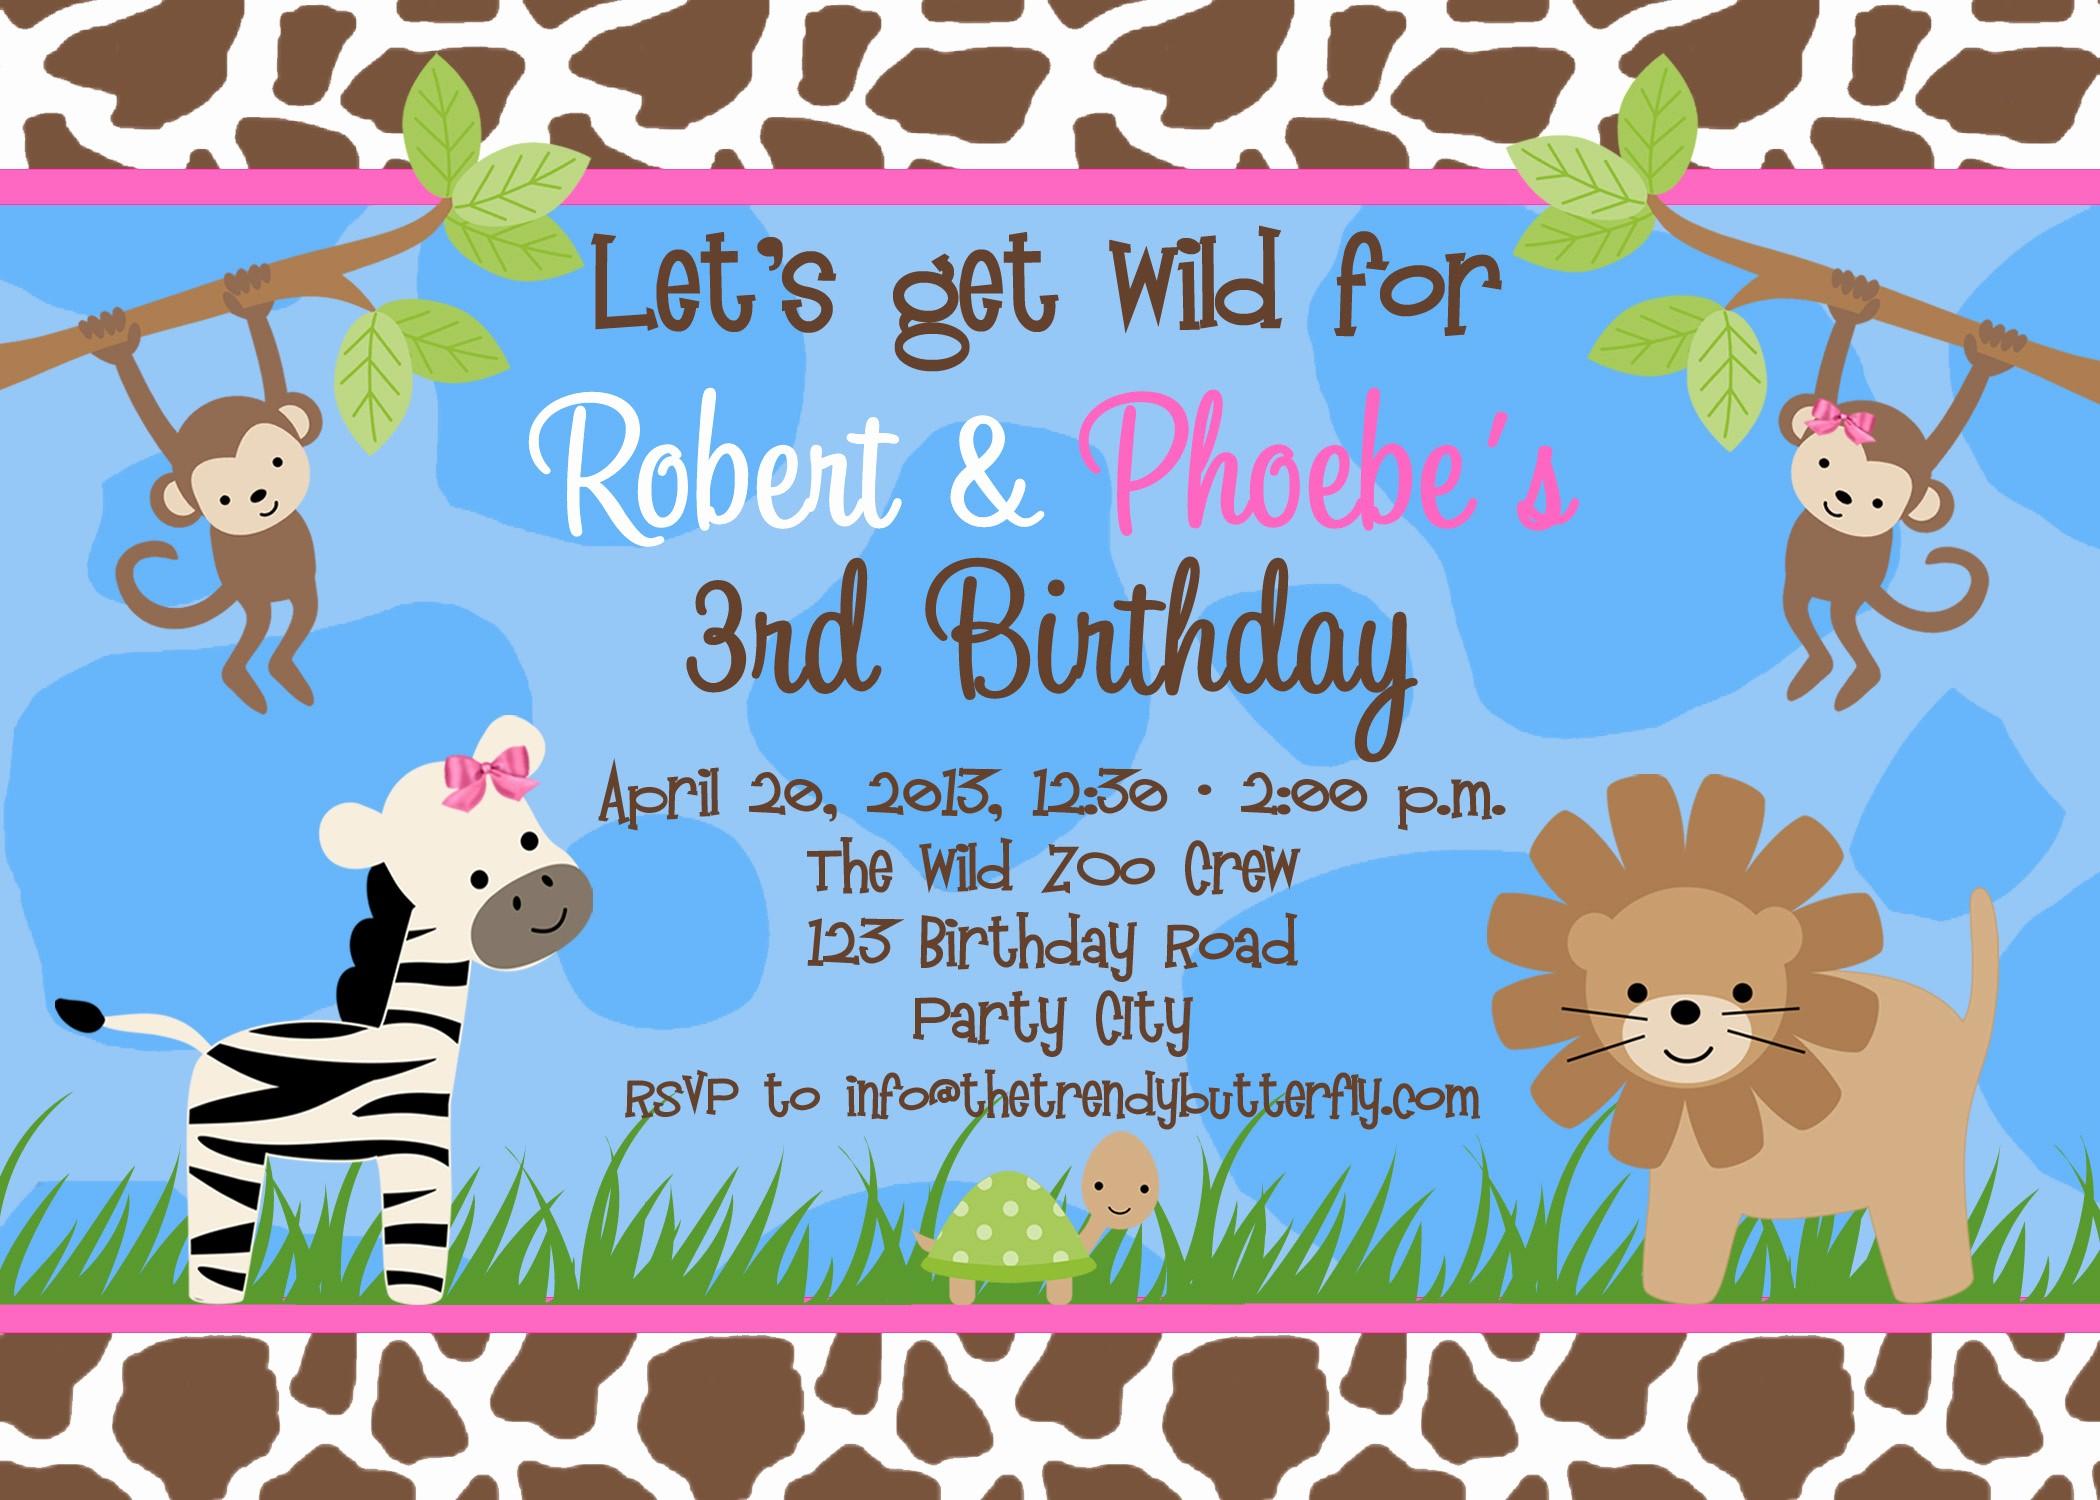 Free Templates for Birthday Invitations New Free Birthday Party Invitation Templates